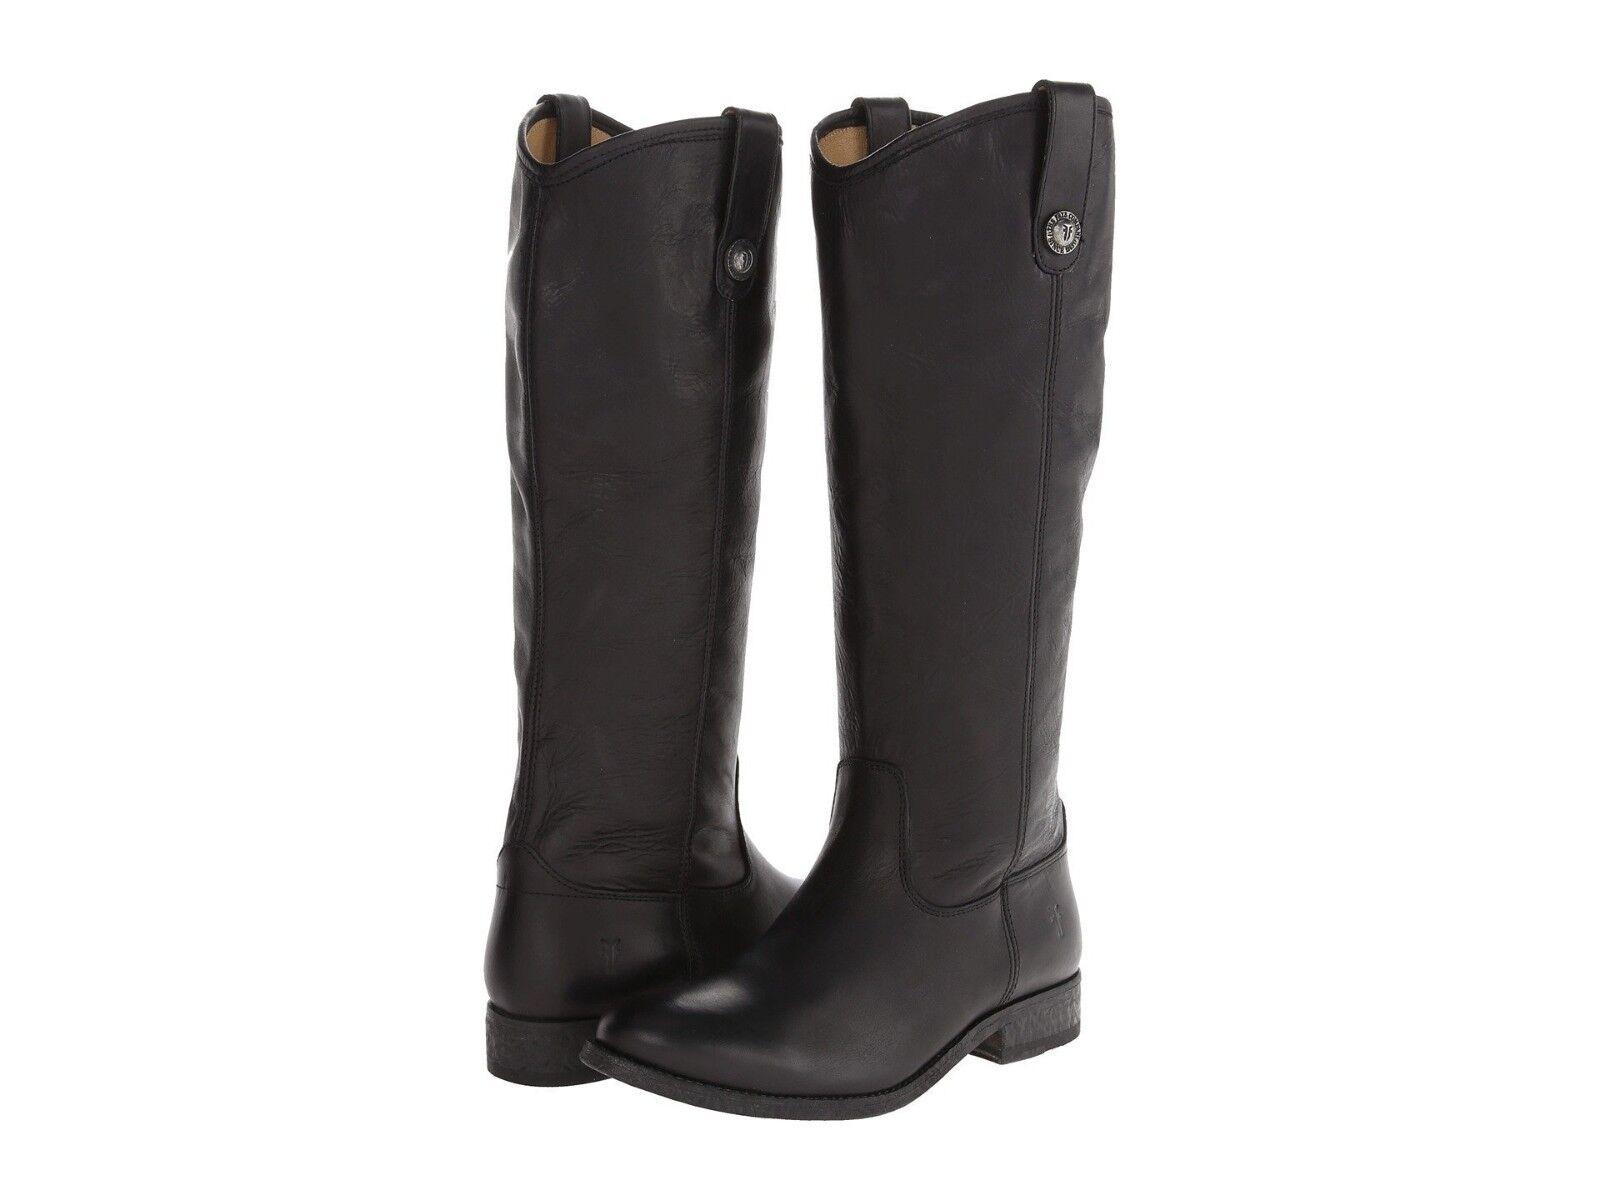 New Frye Melissa Button Black sz Leather Tall Riding Boot, sz Black 8 $368 ed6b35